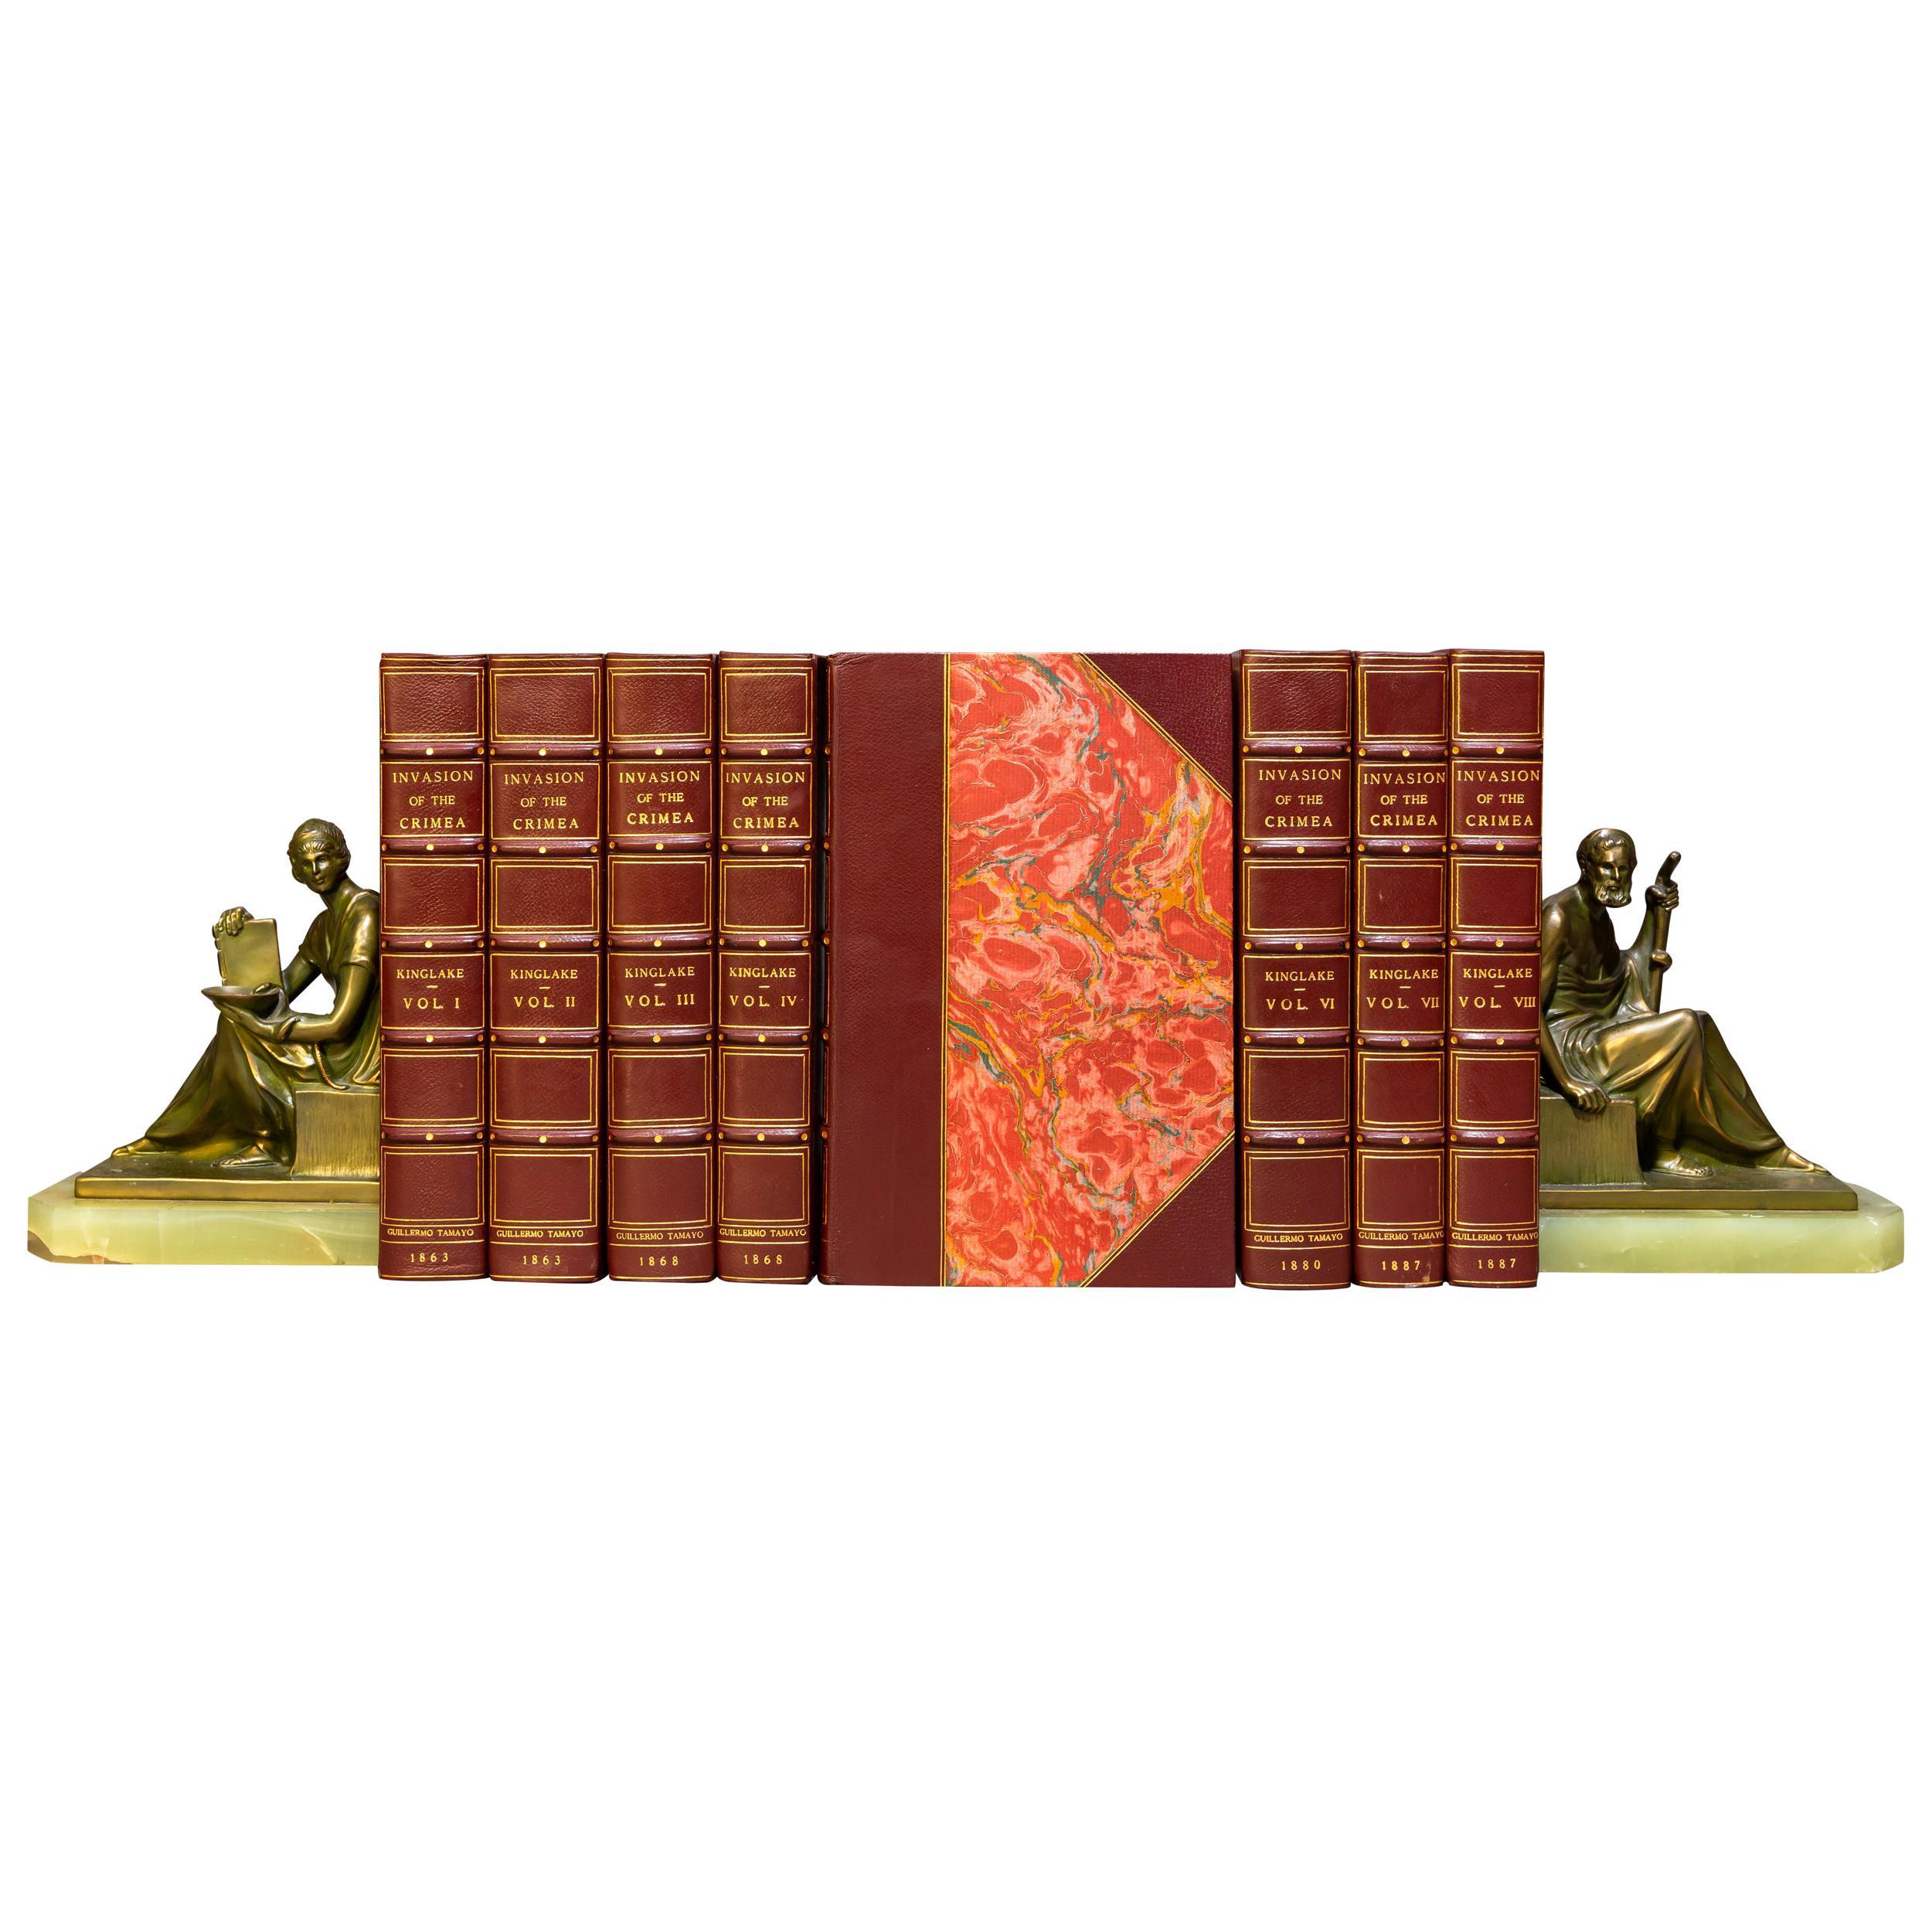 'Book Sets' 8 Volumes, Alexander Kinglake, The Invasion Of The Crimea